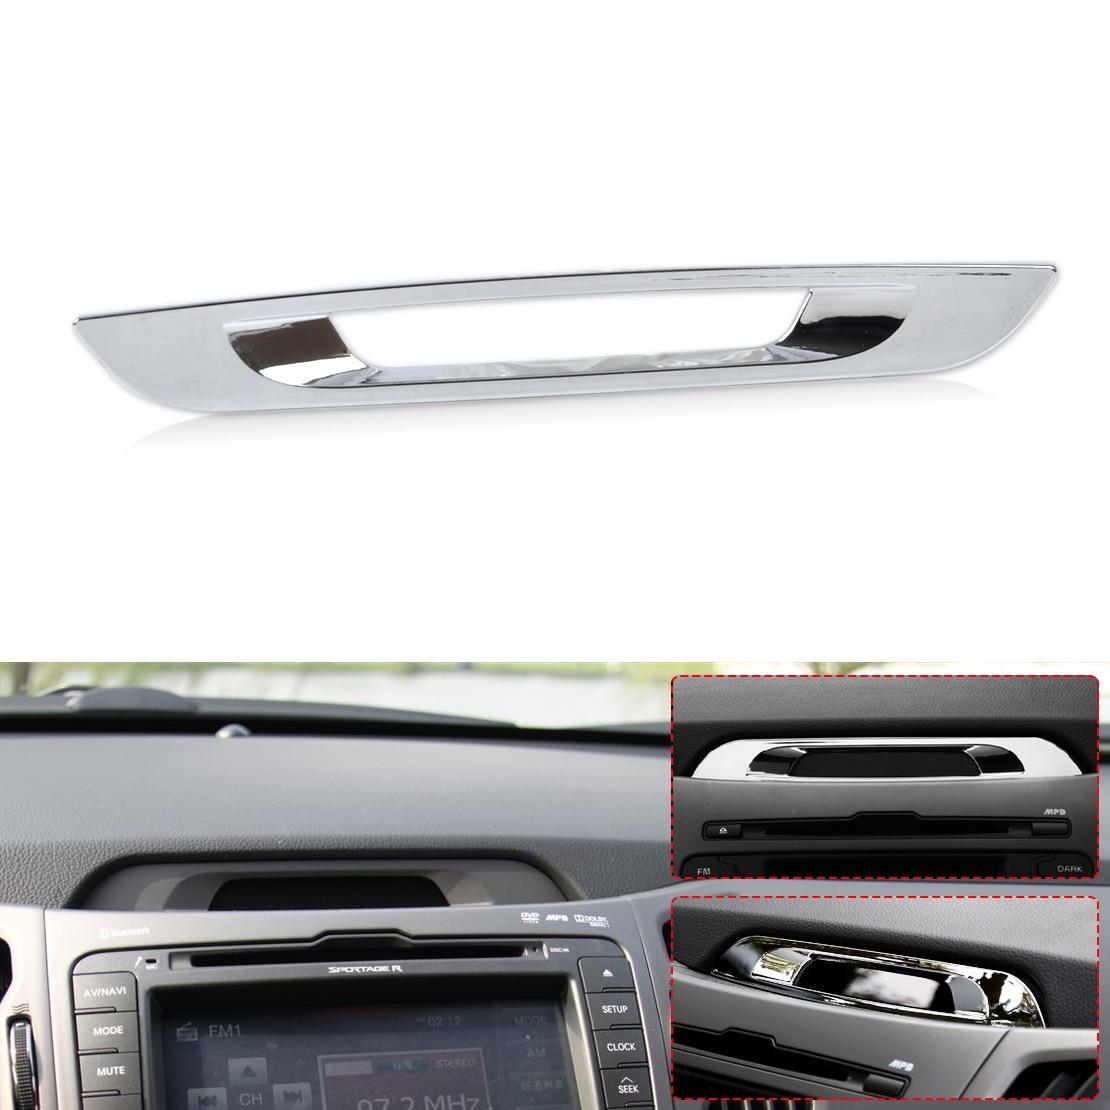 2012 Kia Sportage Interior: CITALL Chrome Interior Console Display Molding Trim For